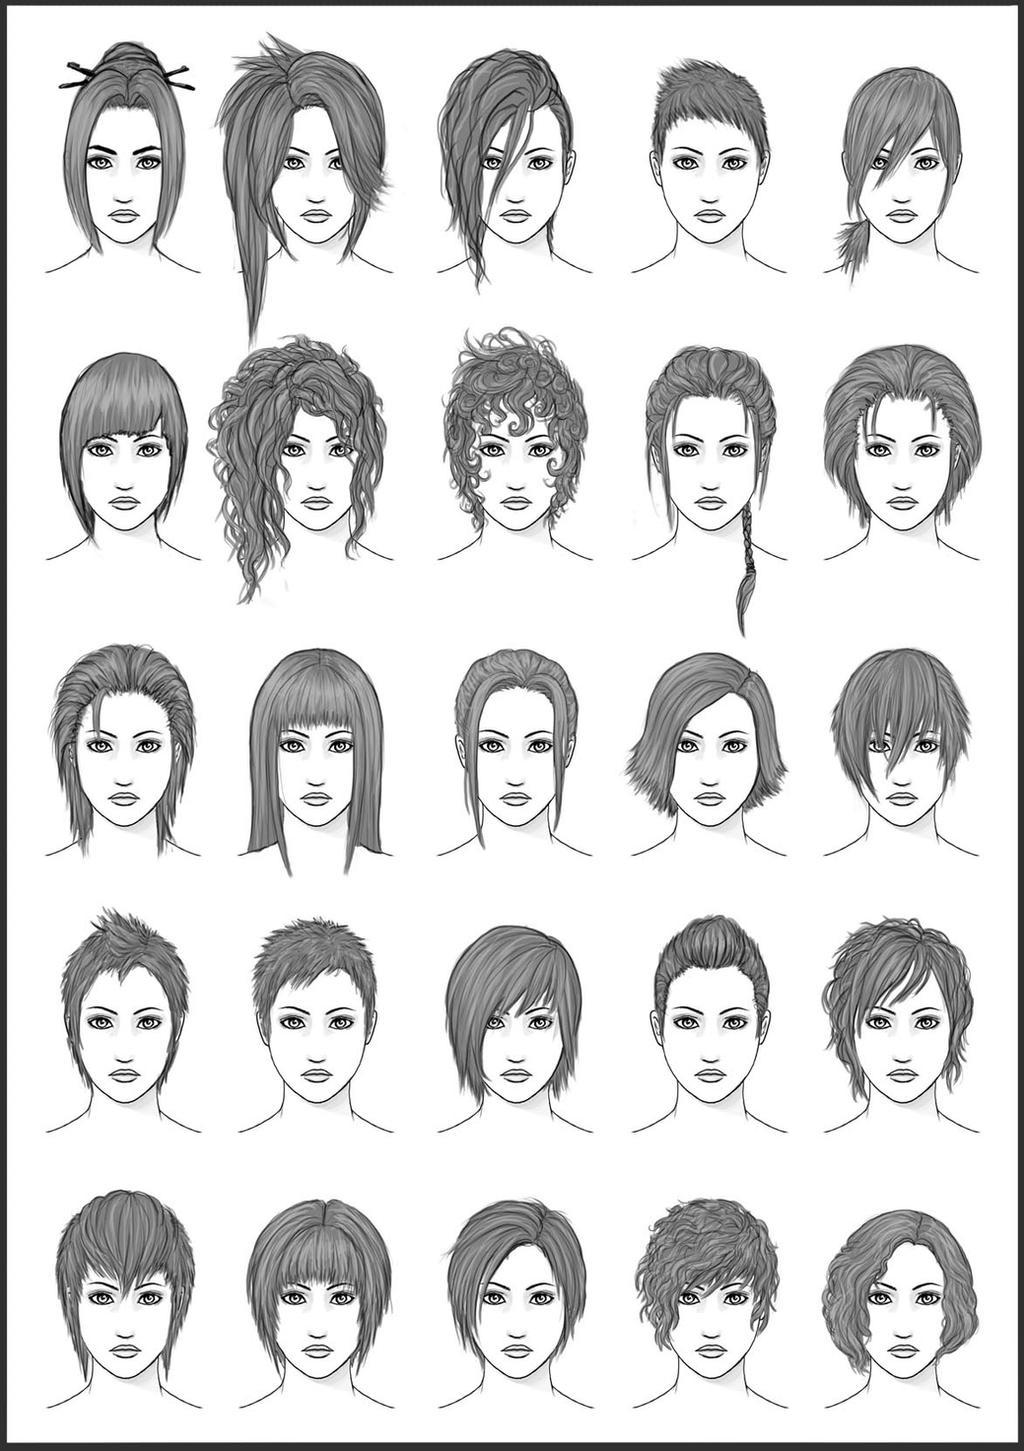 Terms for female facial hair